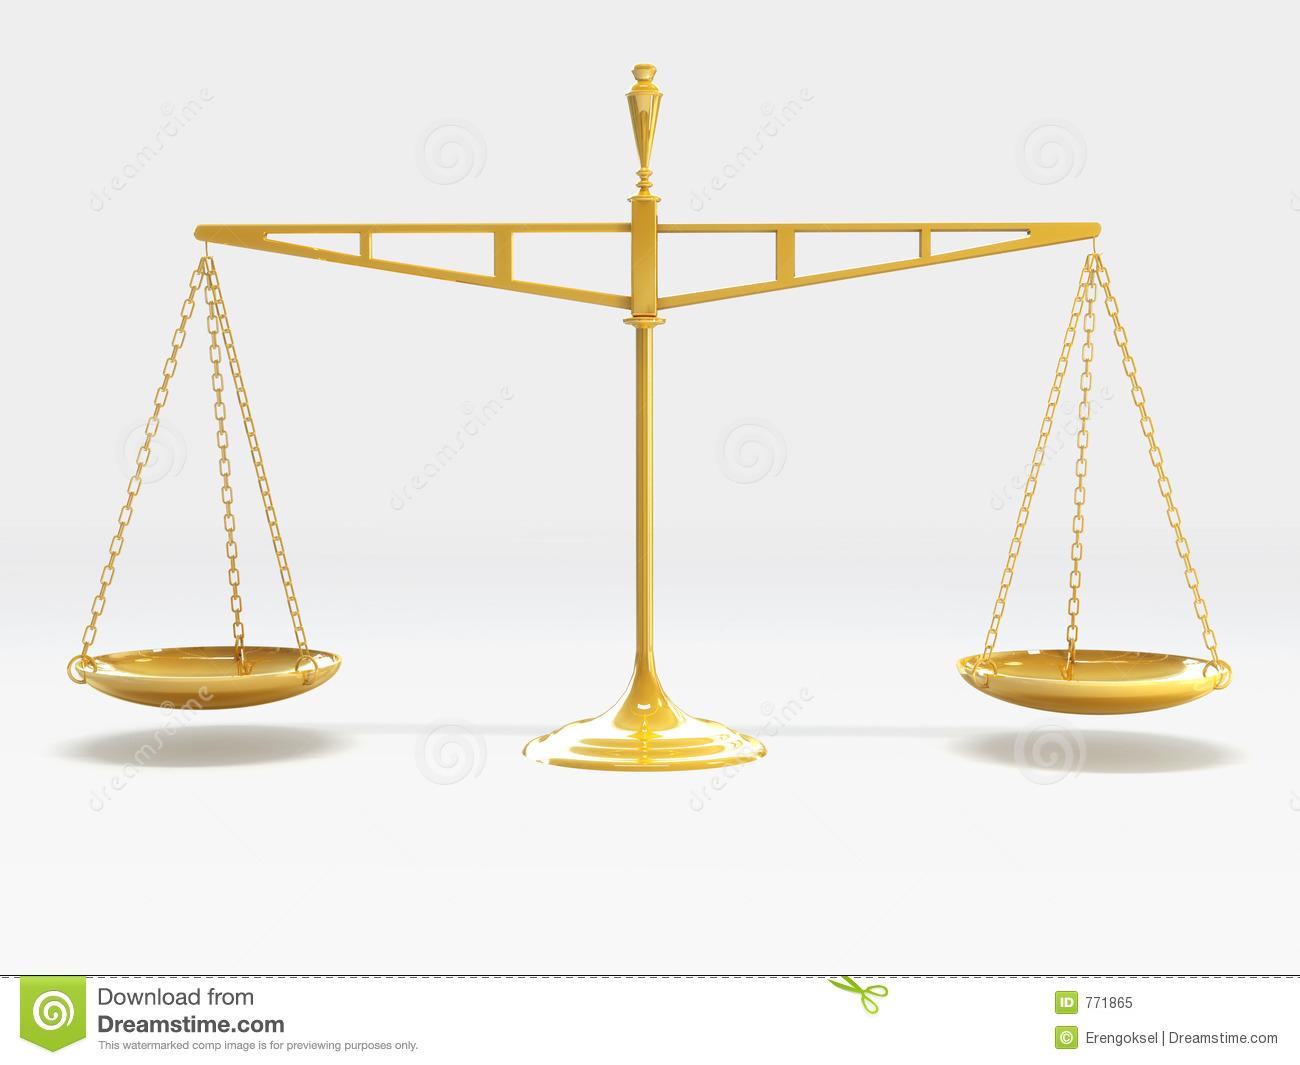 scales of justice quotes quotesgram